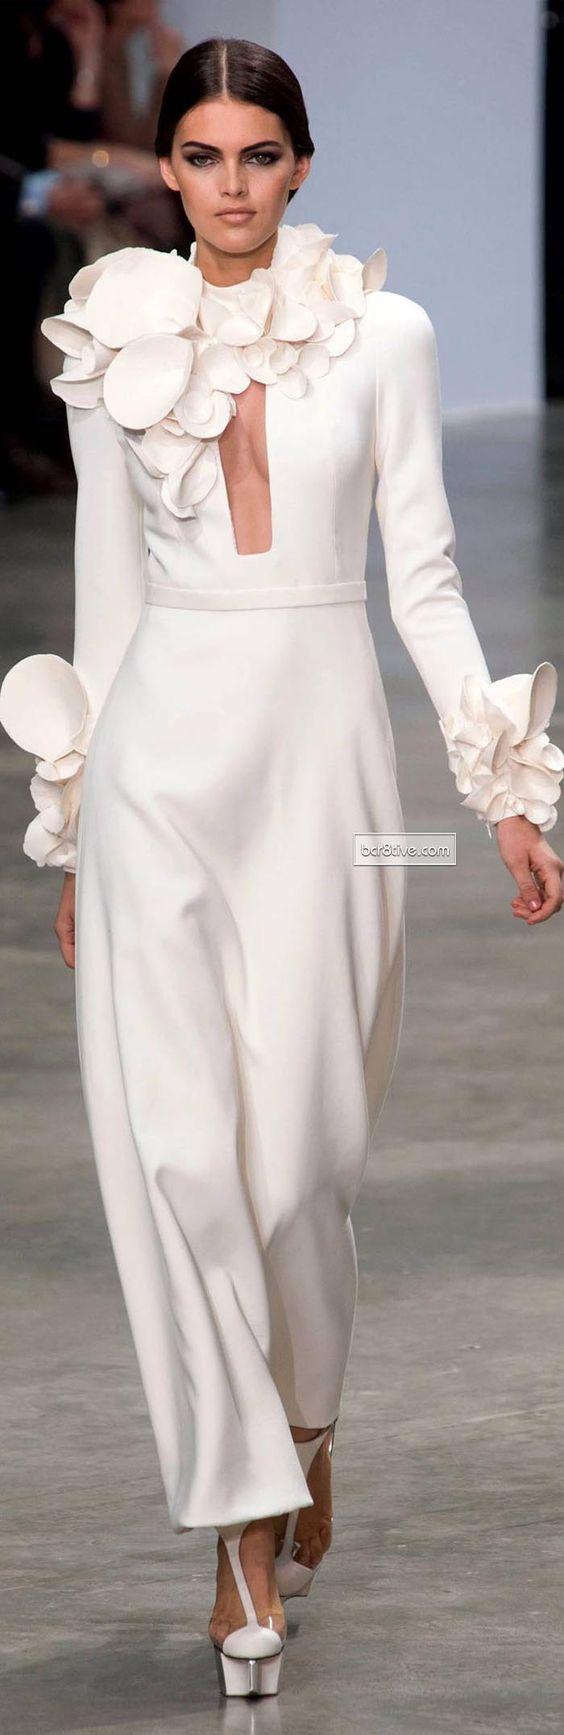 Stephane Rolland Spring Summer 2013-14 Haute Couture http://pinterest.com/treypeezy http://twitter.com/TreyPeezy http://instagram.com/OceanviewBLVD http://OceanviewBLVD.com